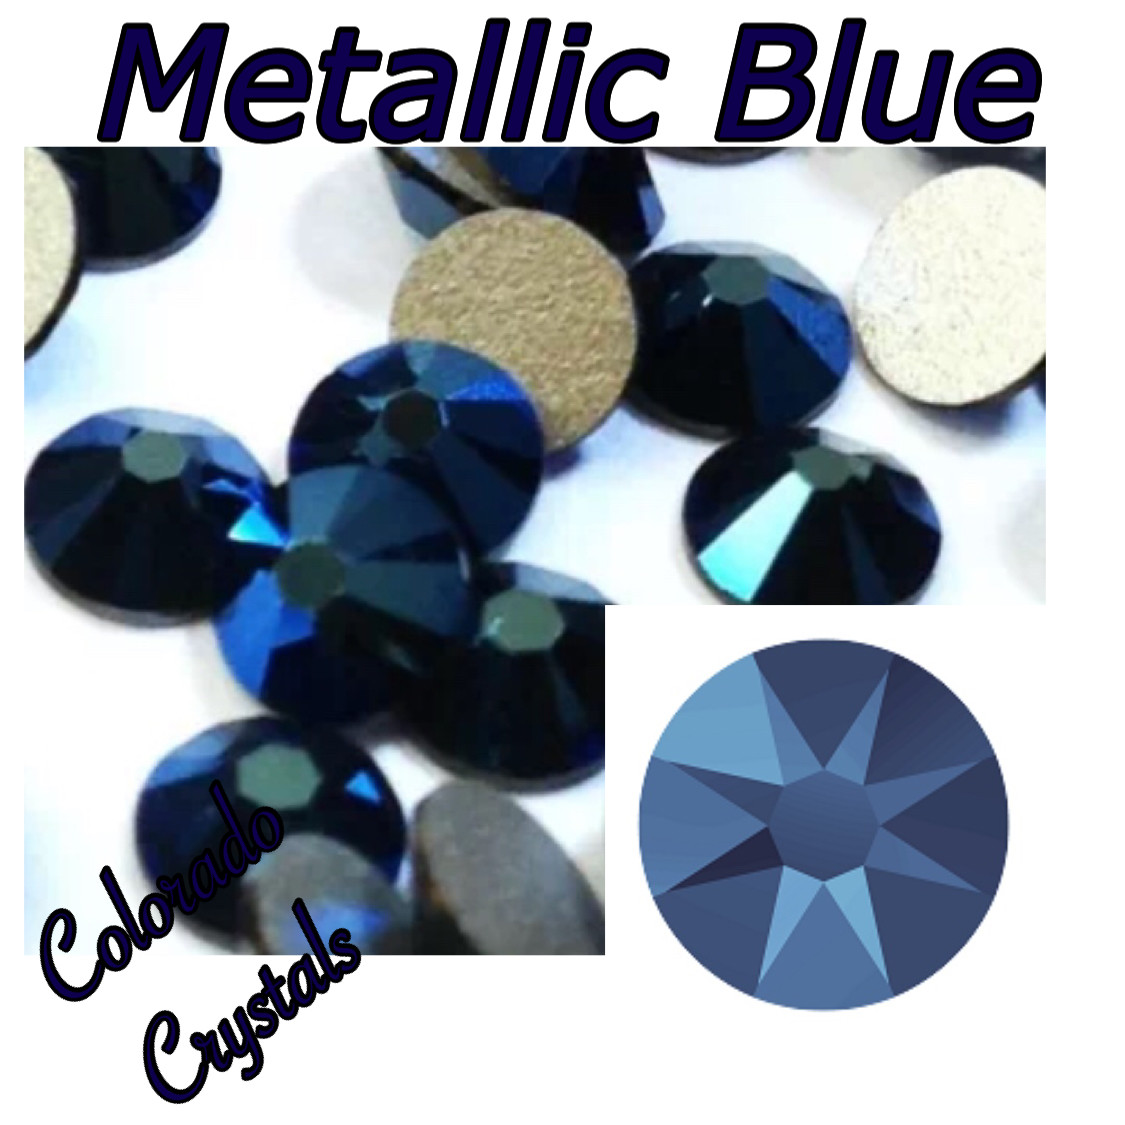 Metallic Blue (Crystal) 16ss 2088